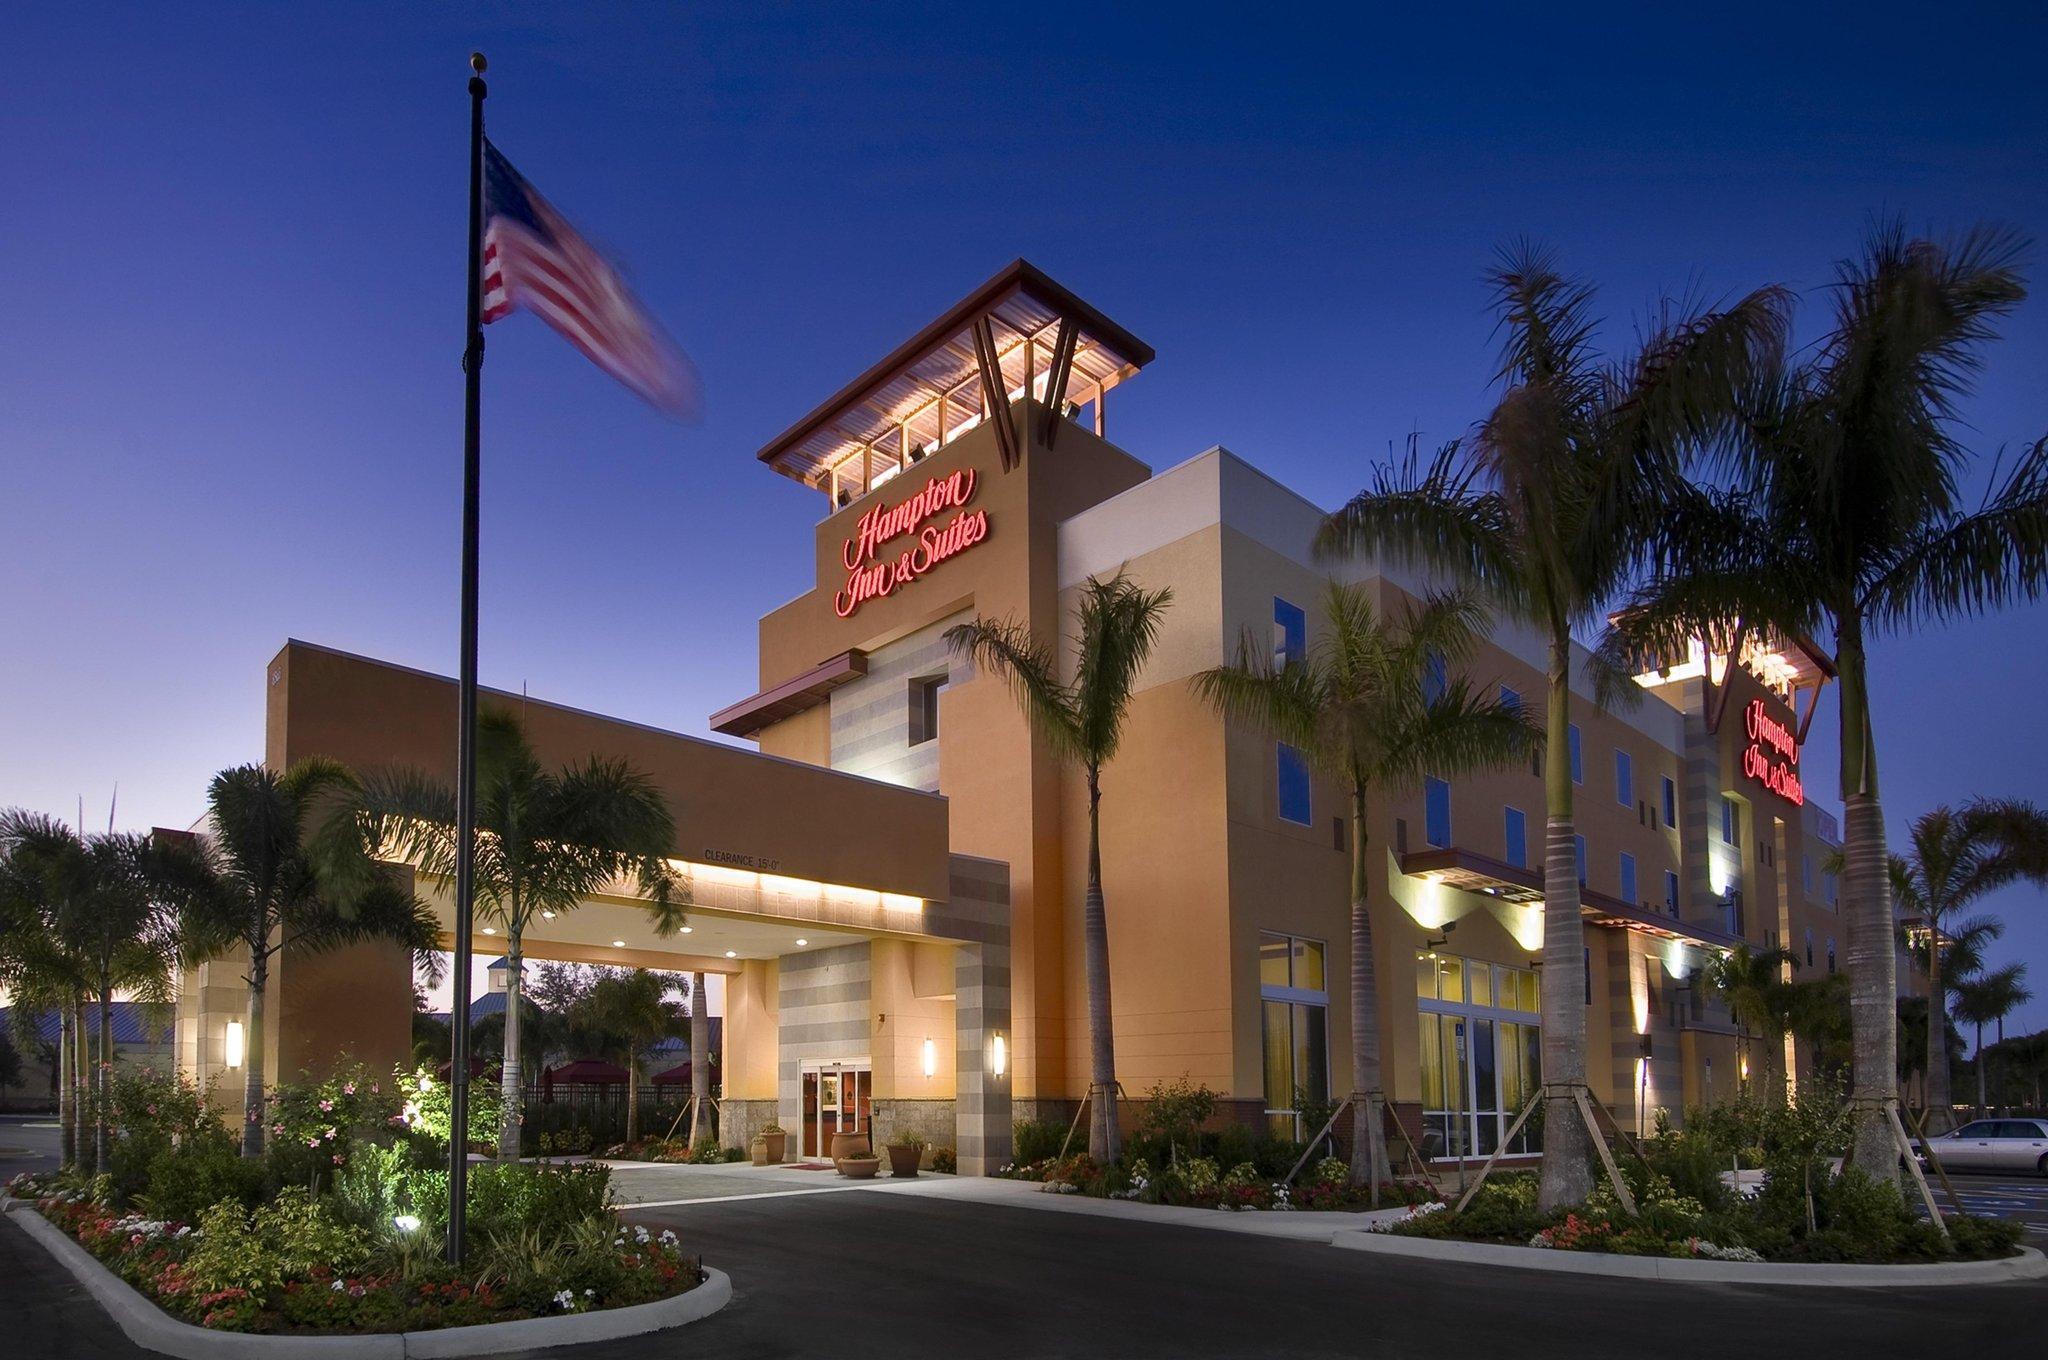 Hampton Inn And Suites Sarasota Lakewood Ranch